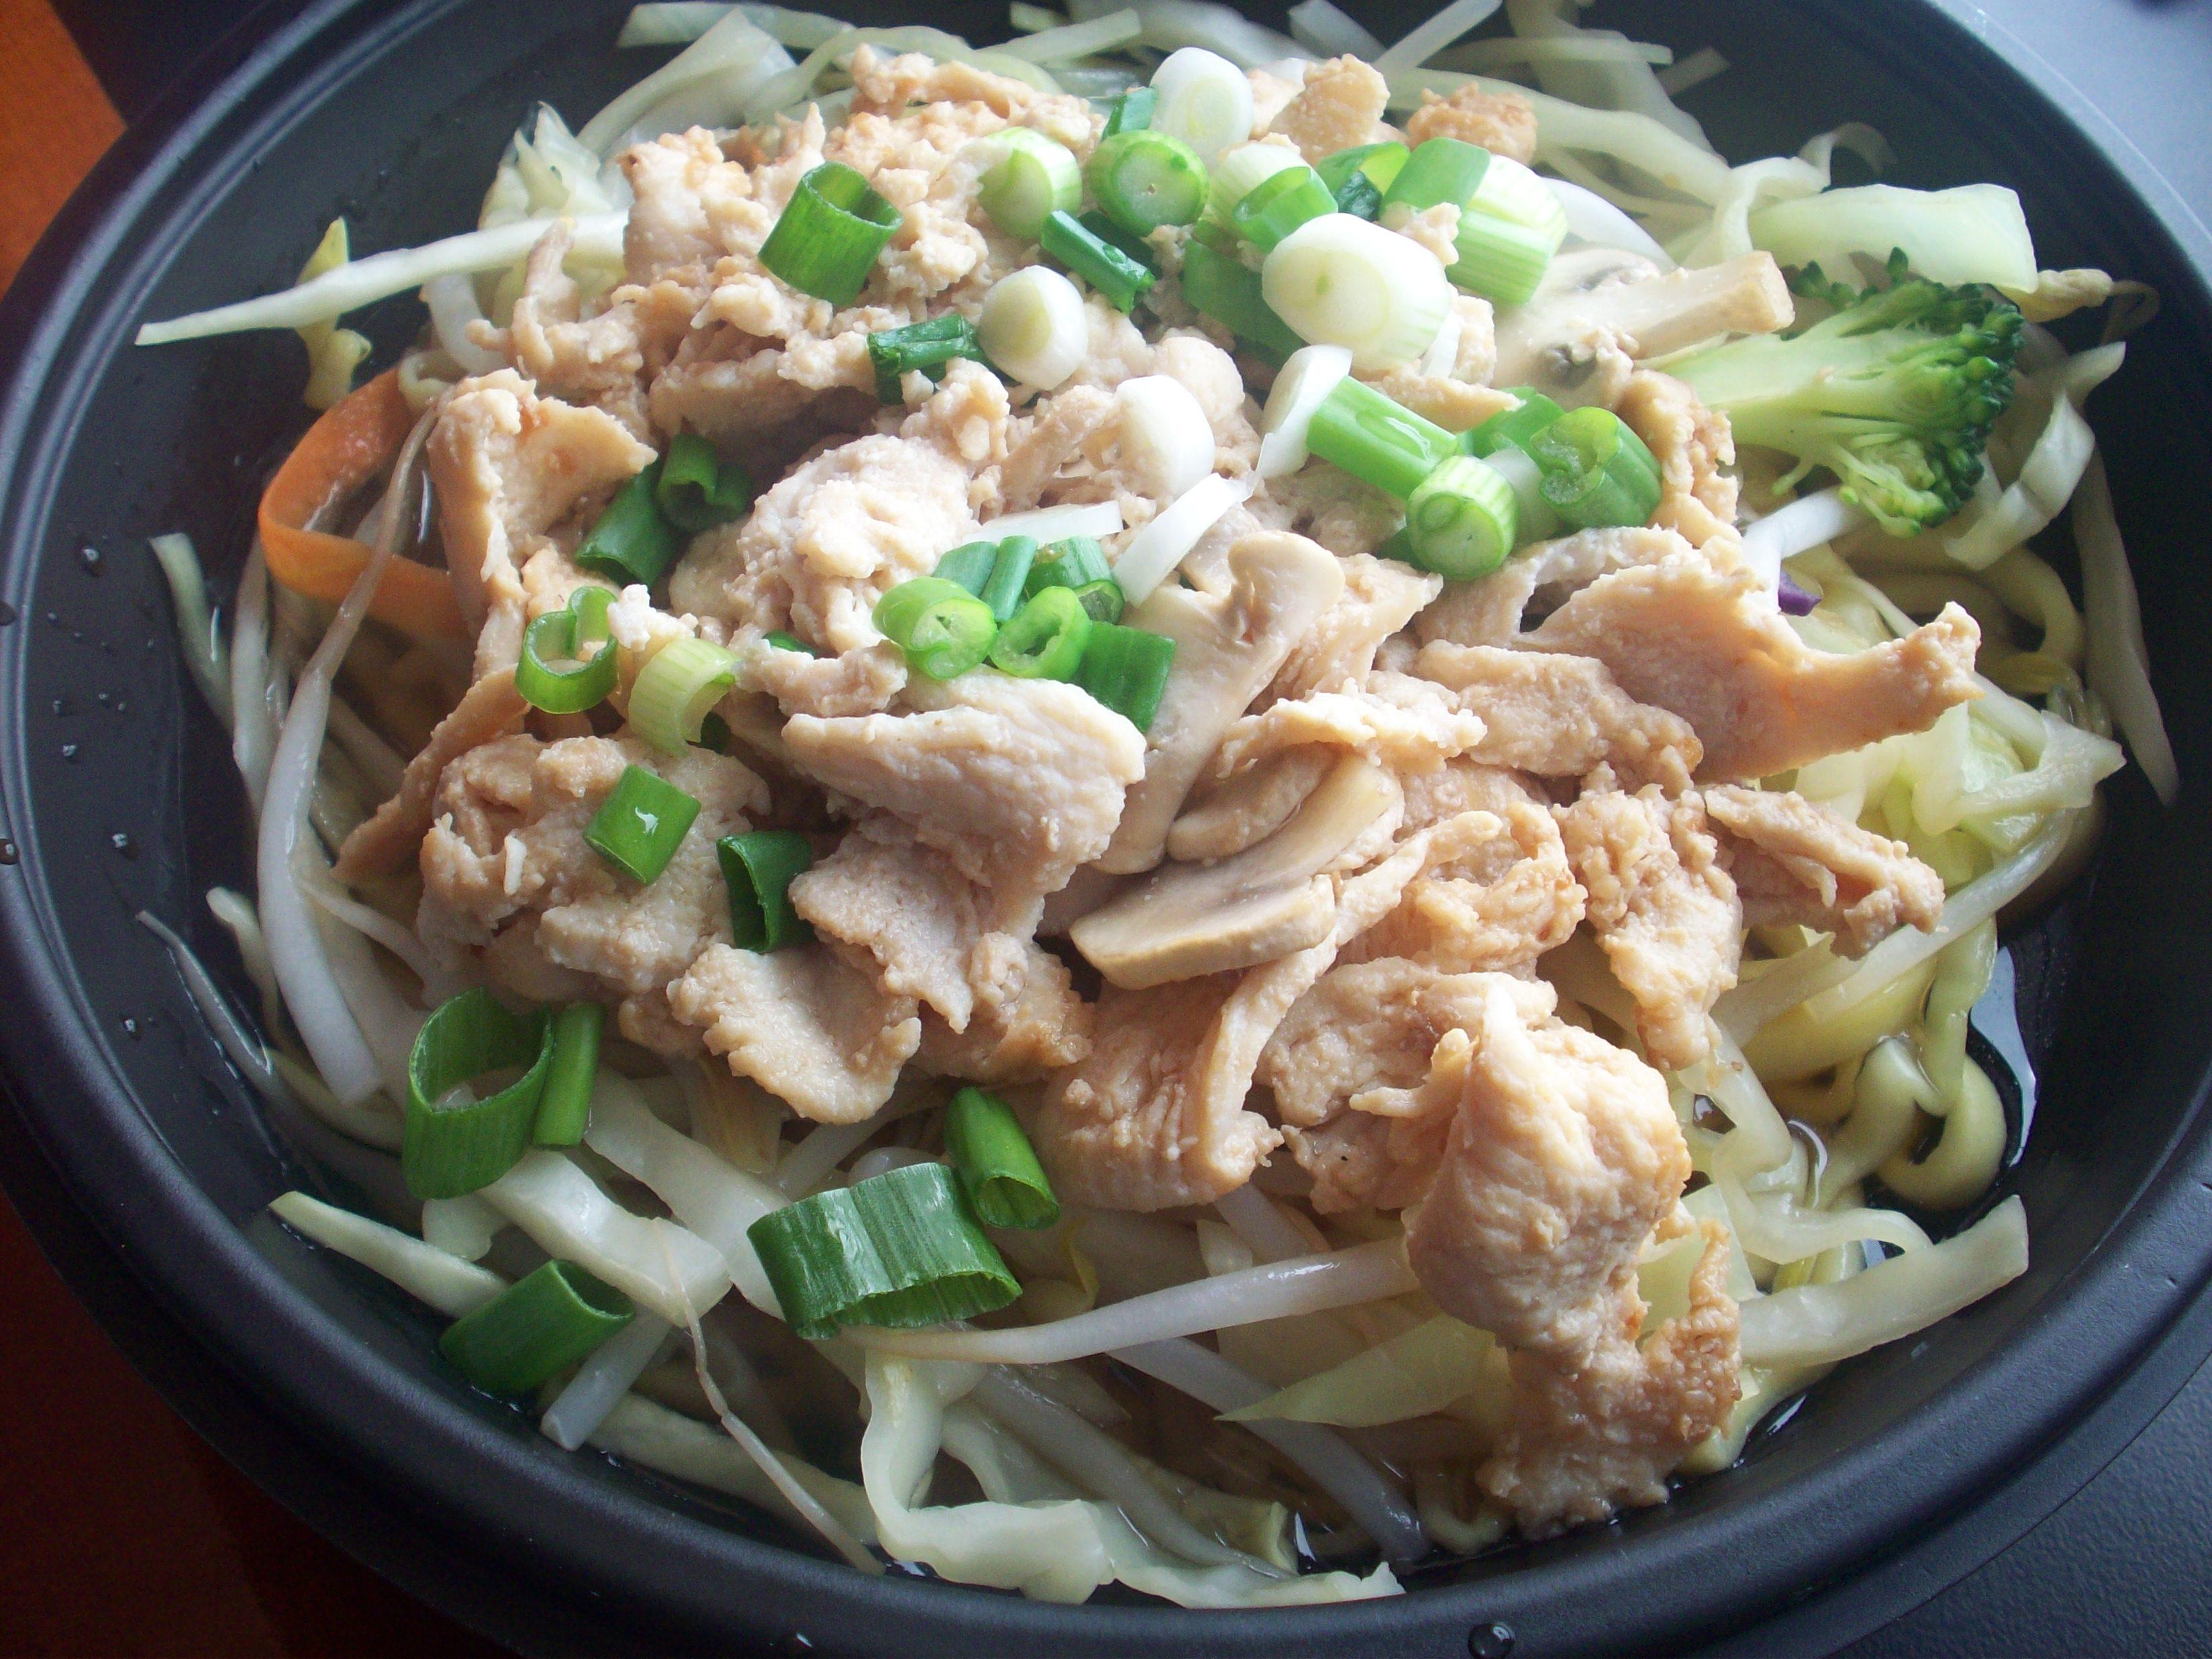 http://foodloader.net/cutie_2010-05-01_Chicken_Noodle_Soup.jpg